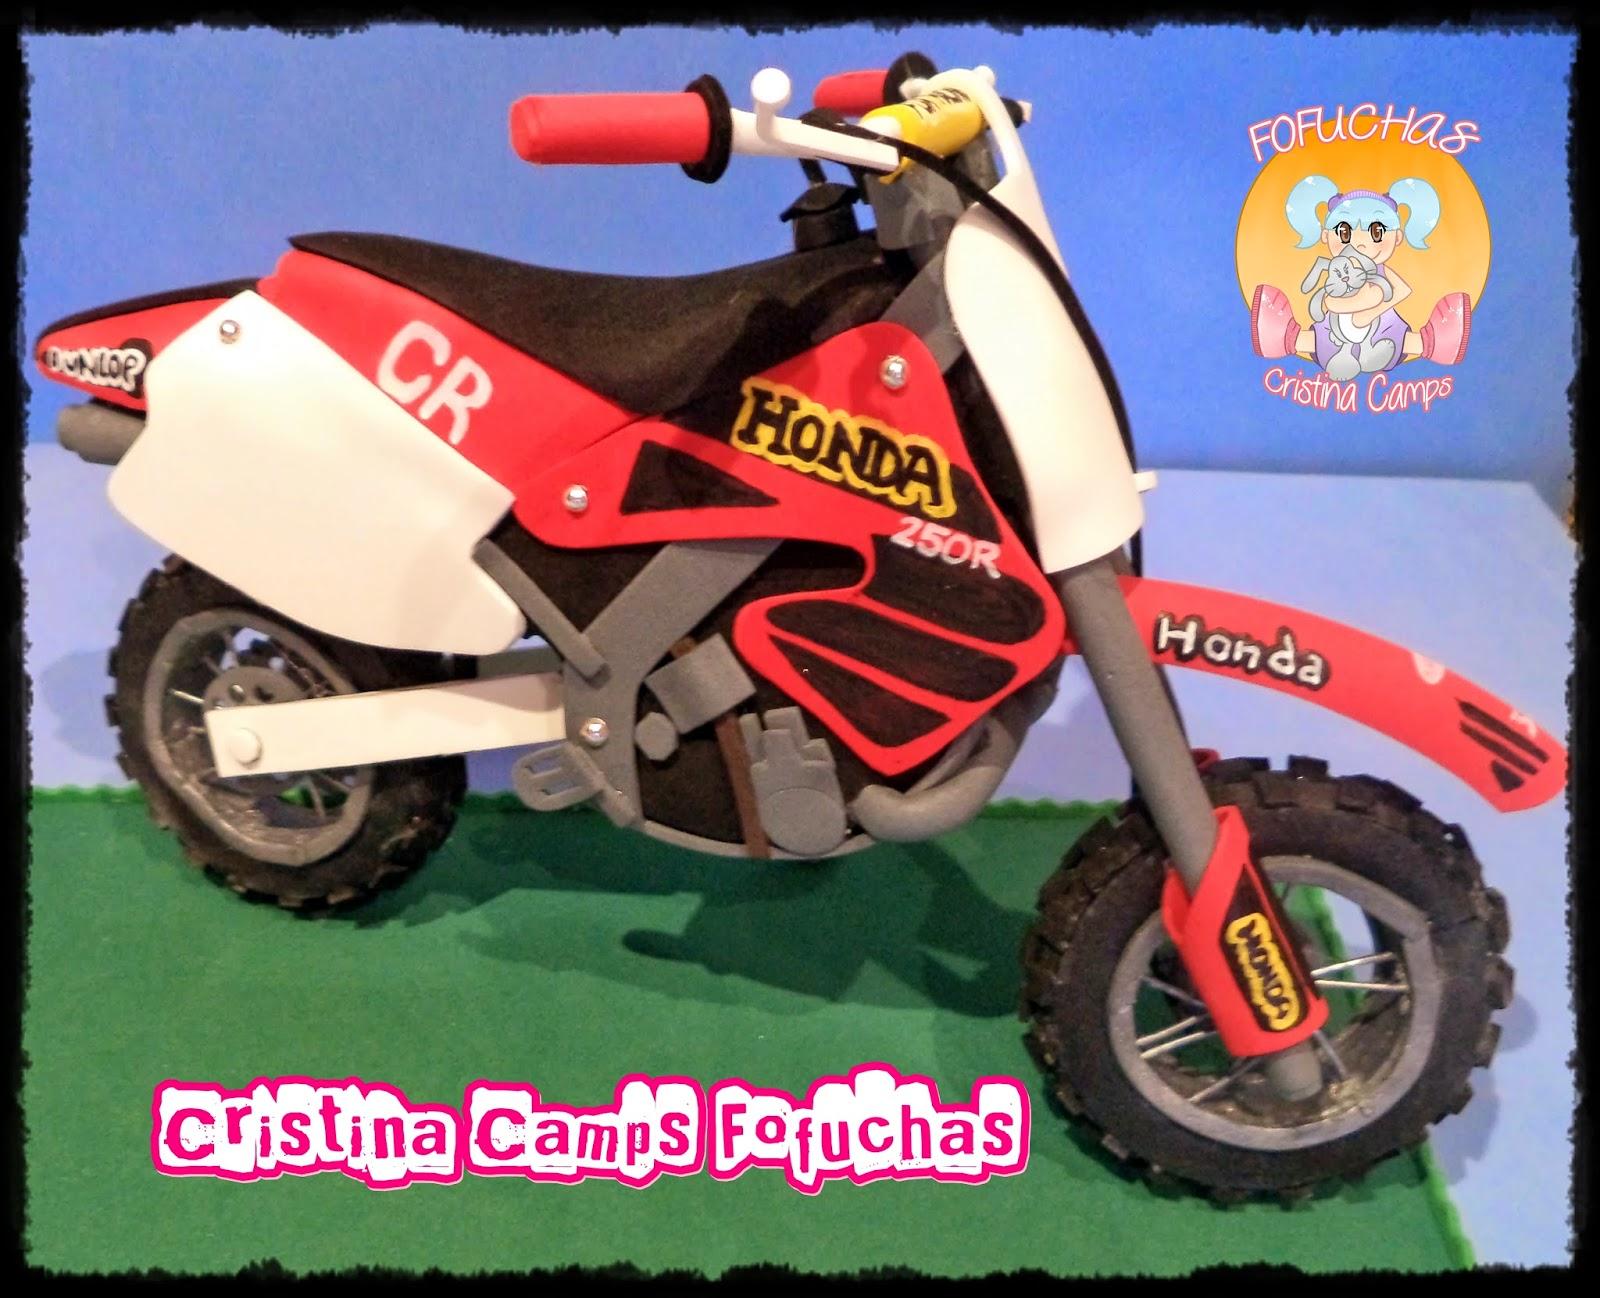 http://cristinacampsfofuchas.blogspot.com/2014/03/fofucha-moto.html